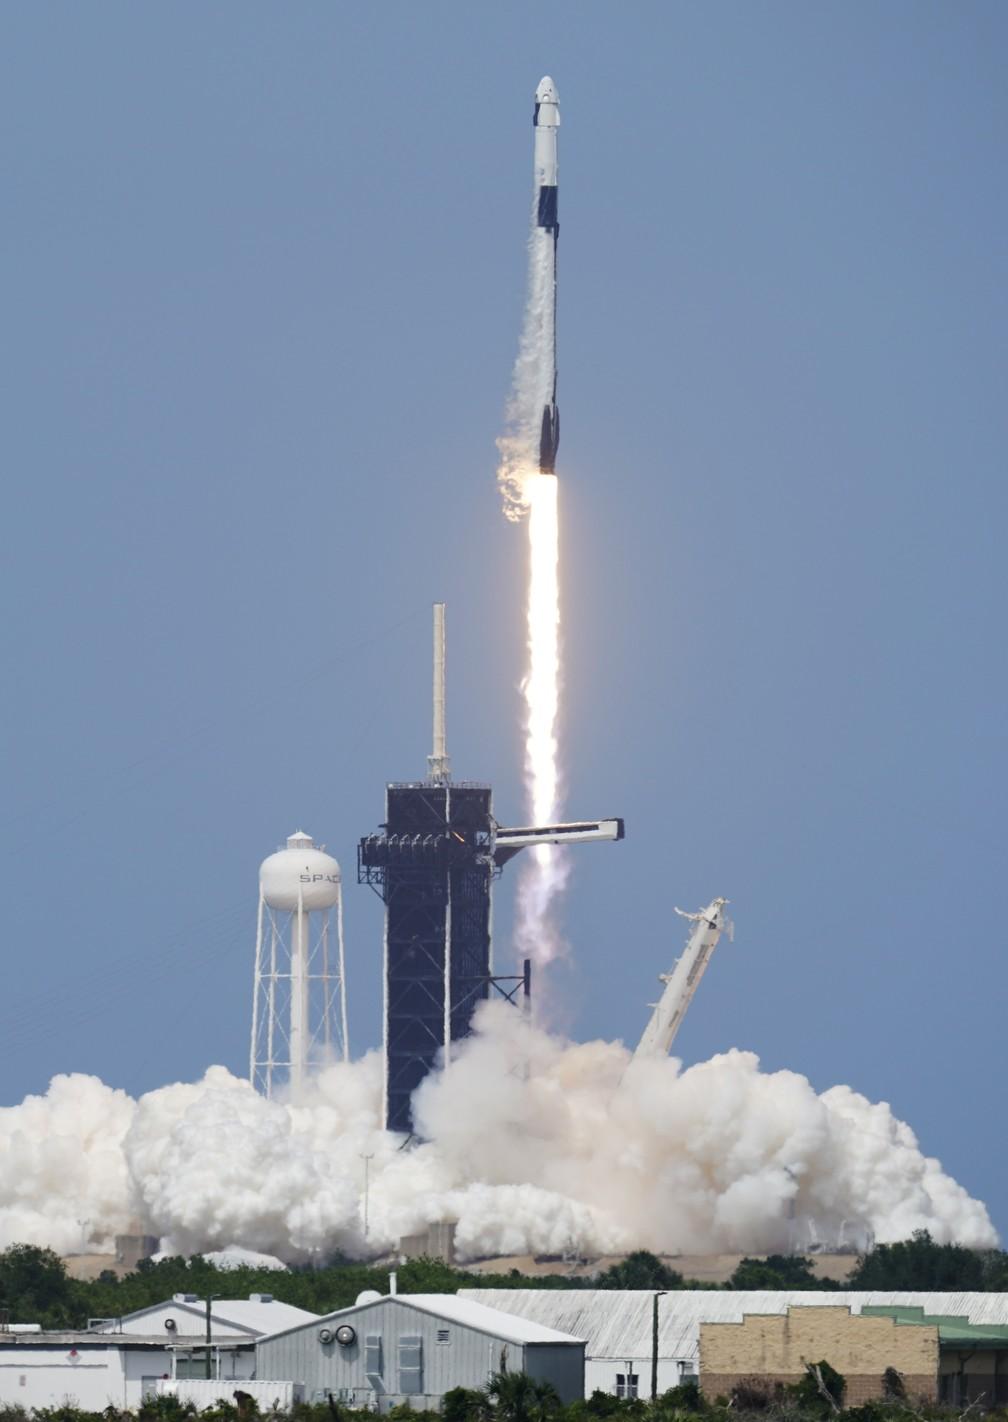 Foguete da SpaceX decola da base do Cabo Canaveral, nos EUA — Foto: David J. Philip/AP Photo